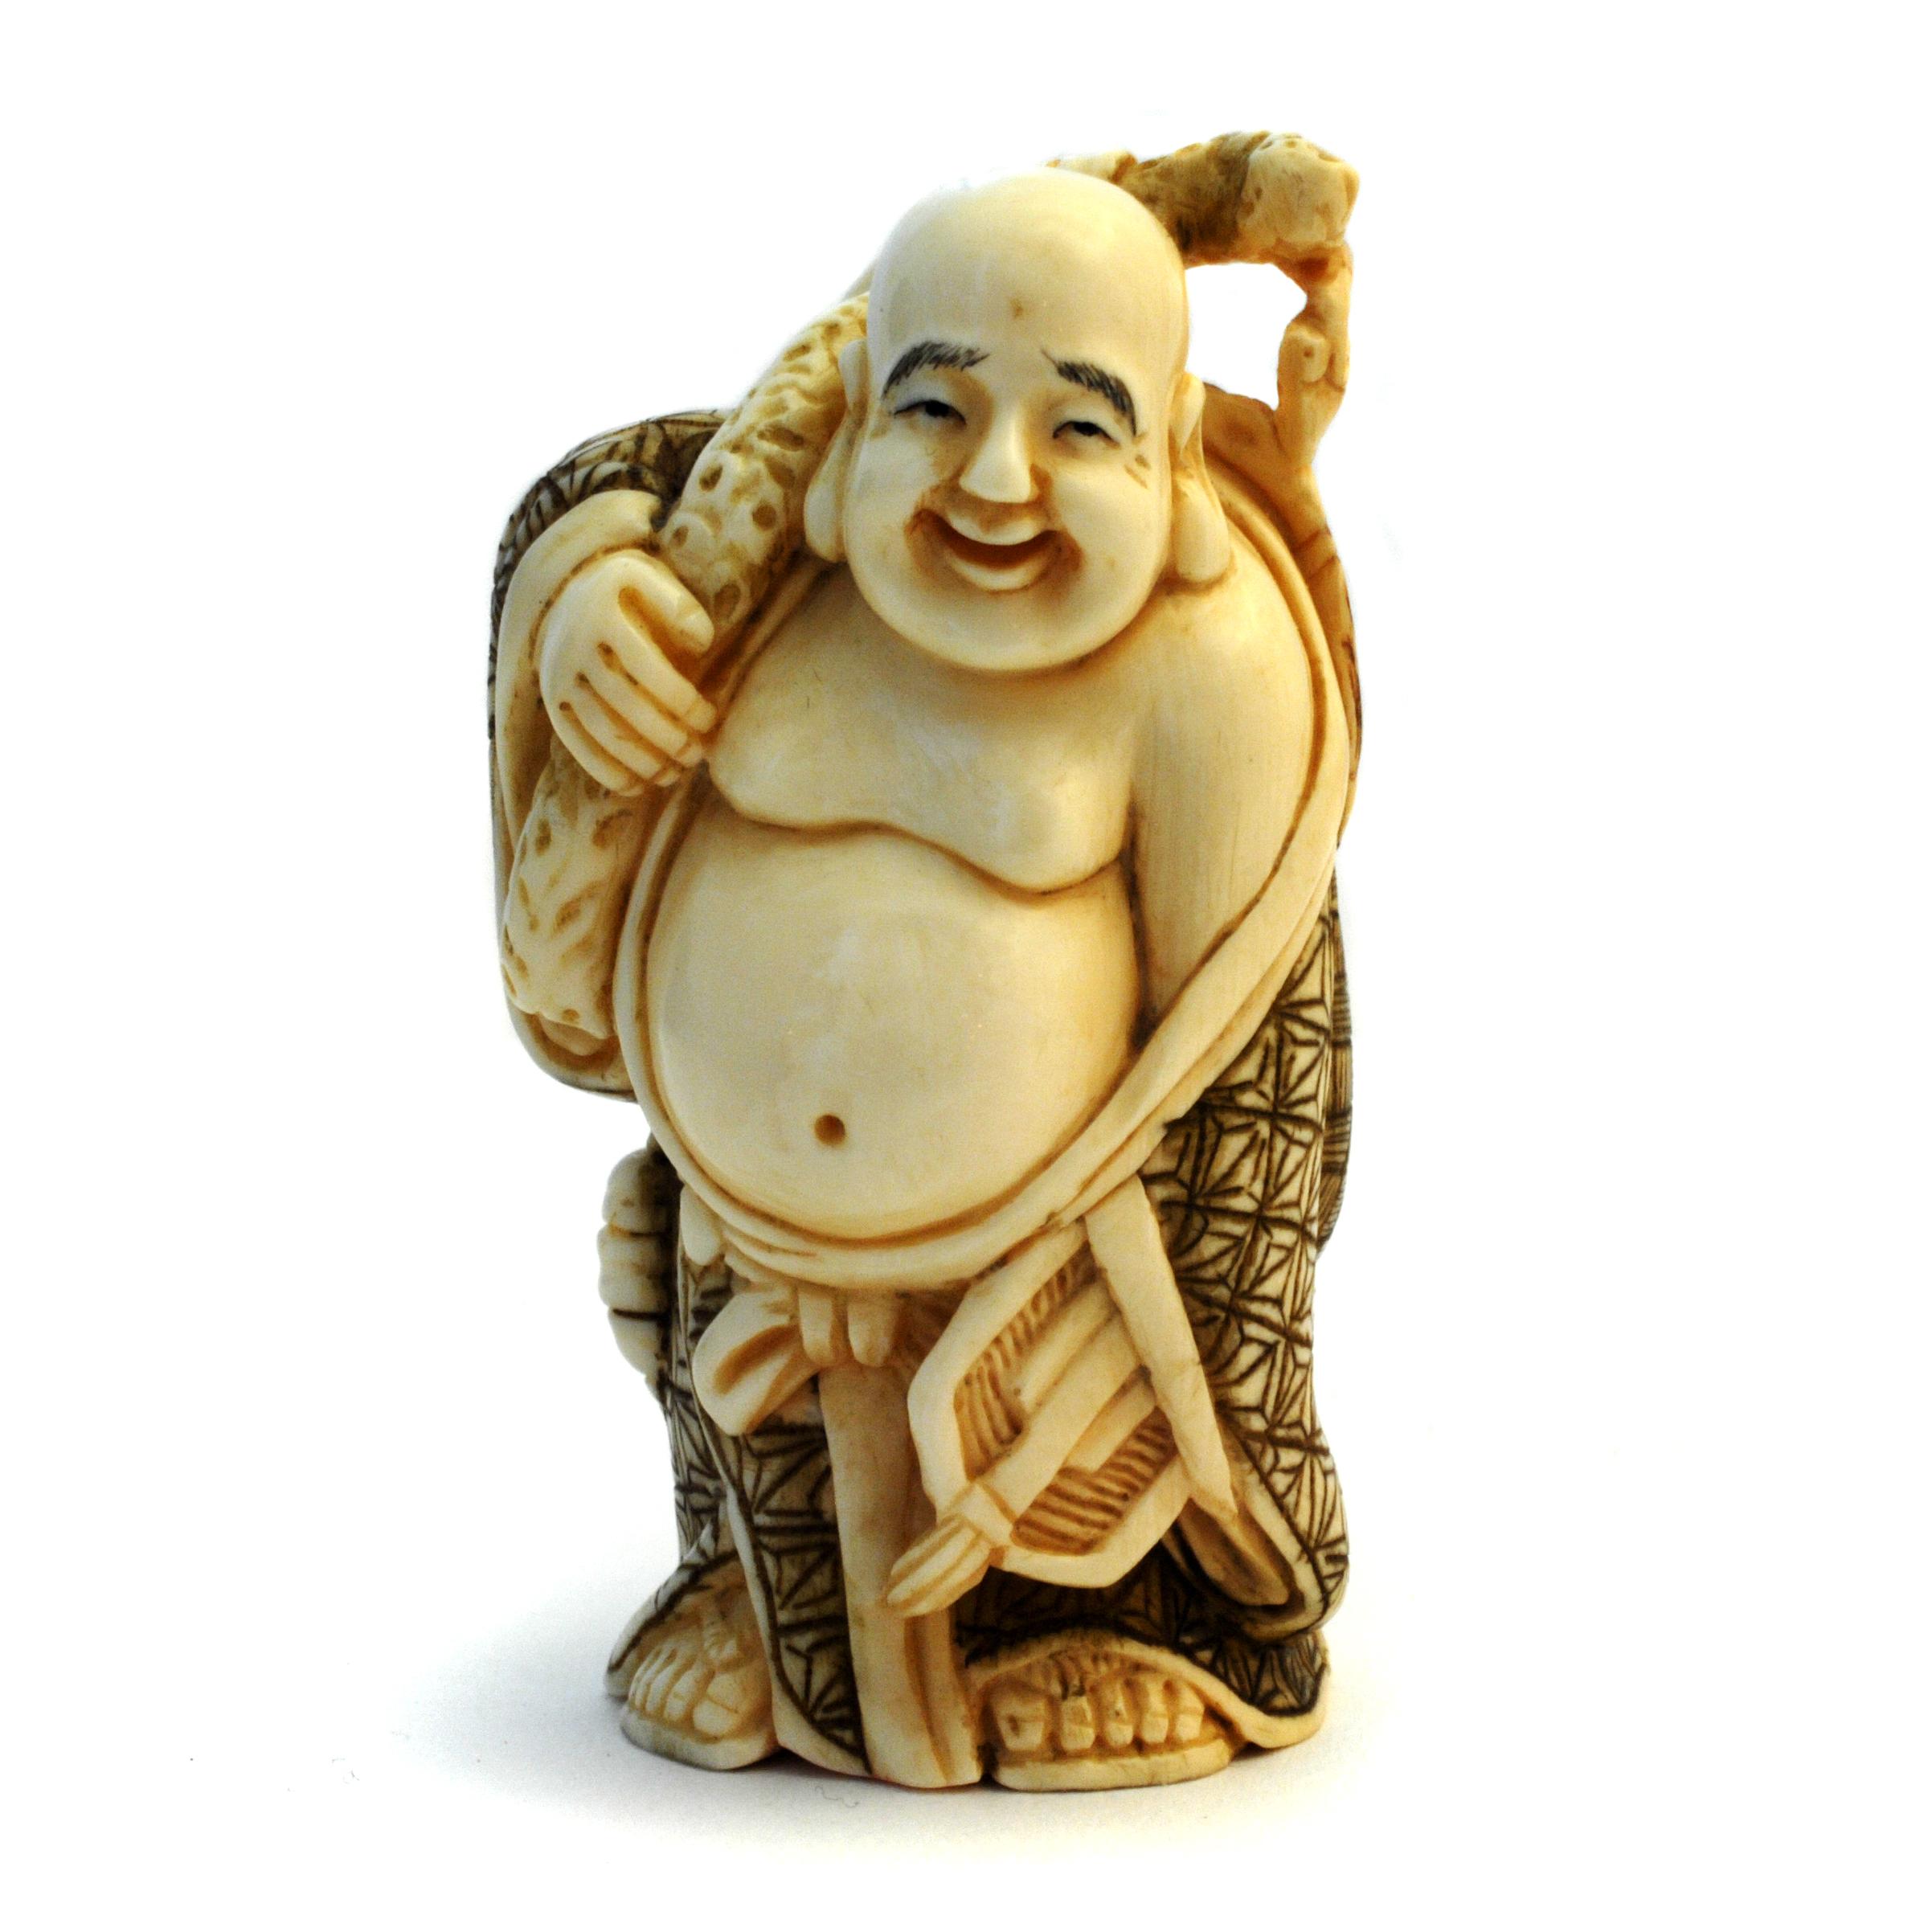 Mammoth_ivory_netsuke_buddha